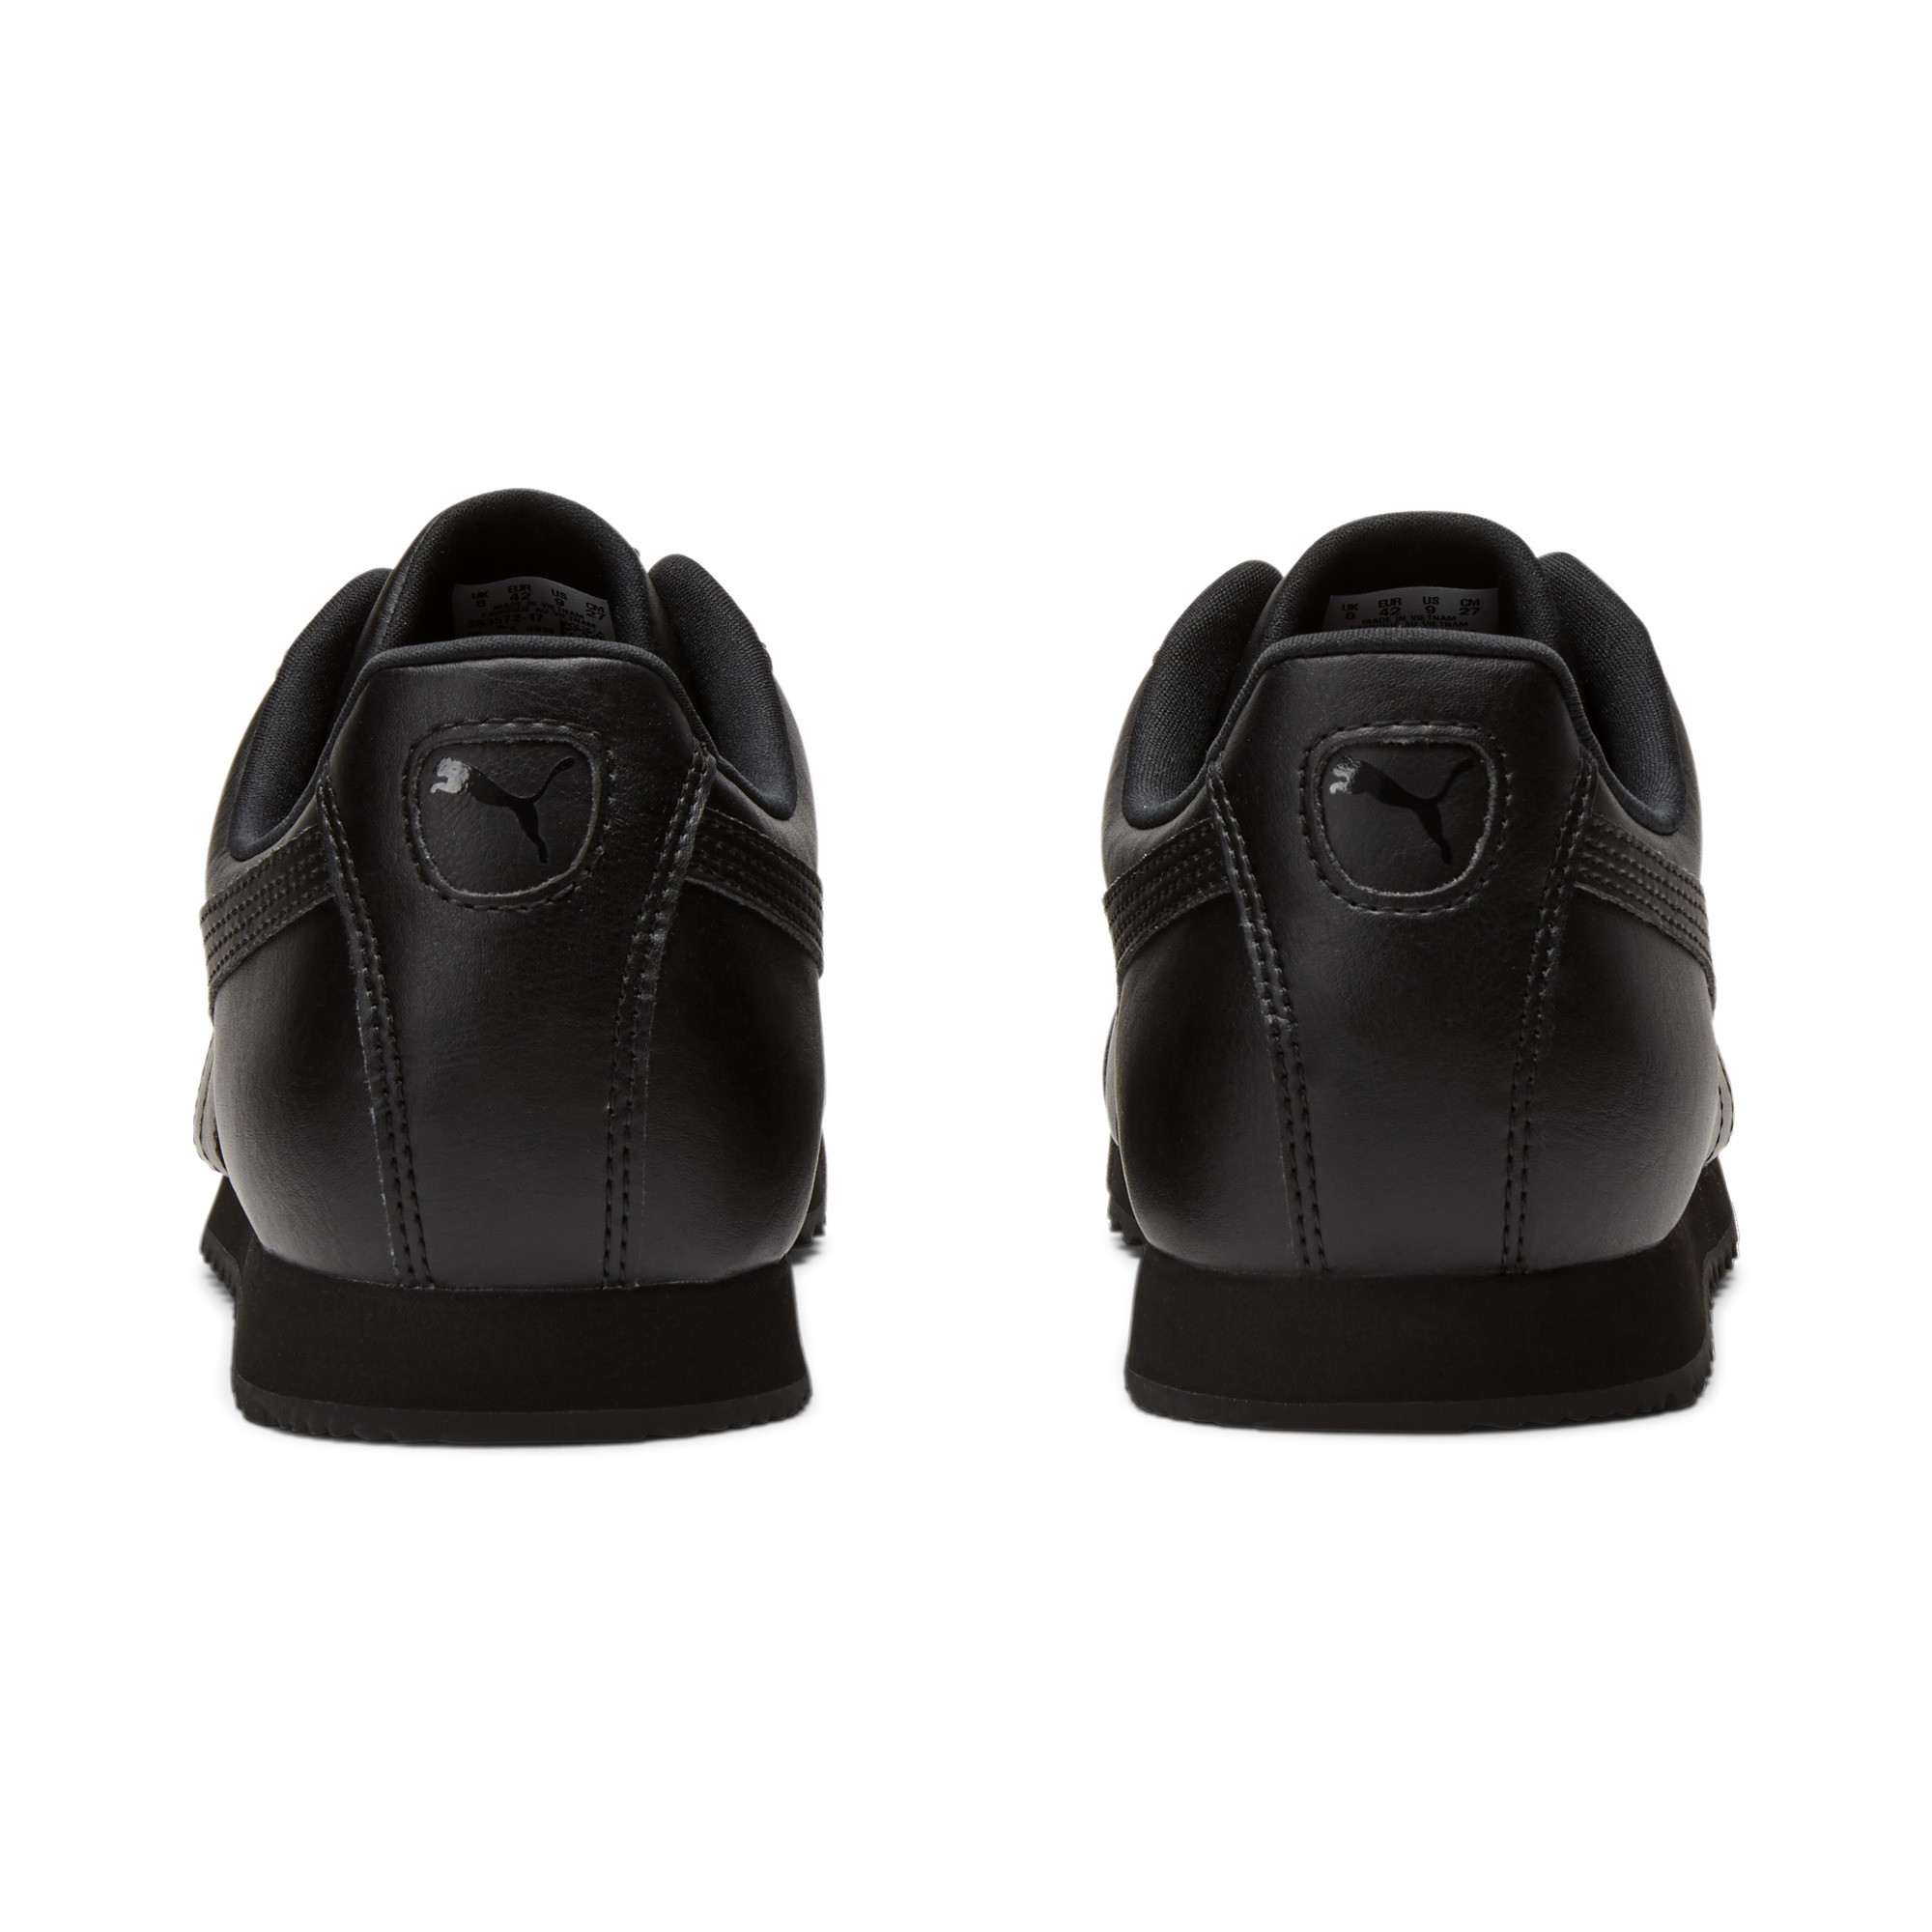 miniature 7 - Puma Men's Roma Basic Sneakers